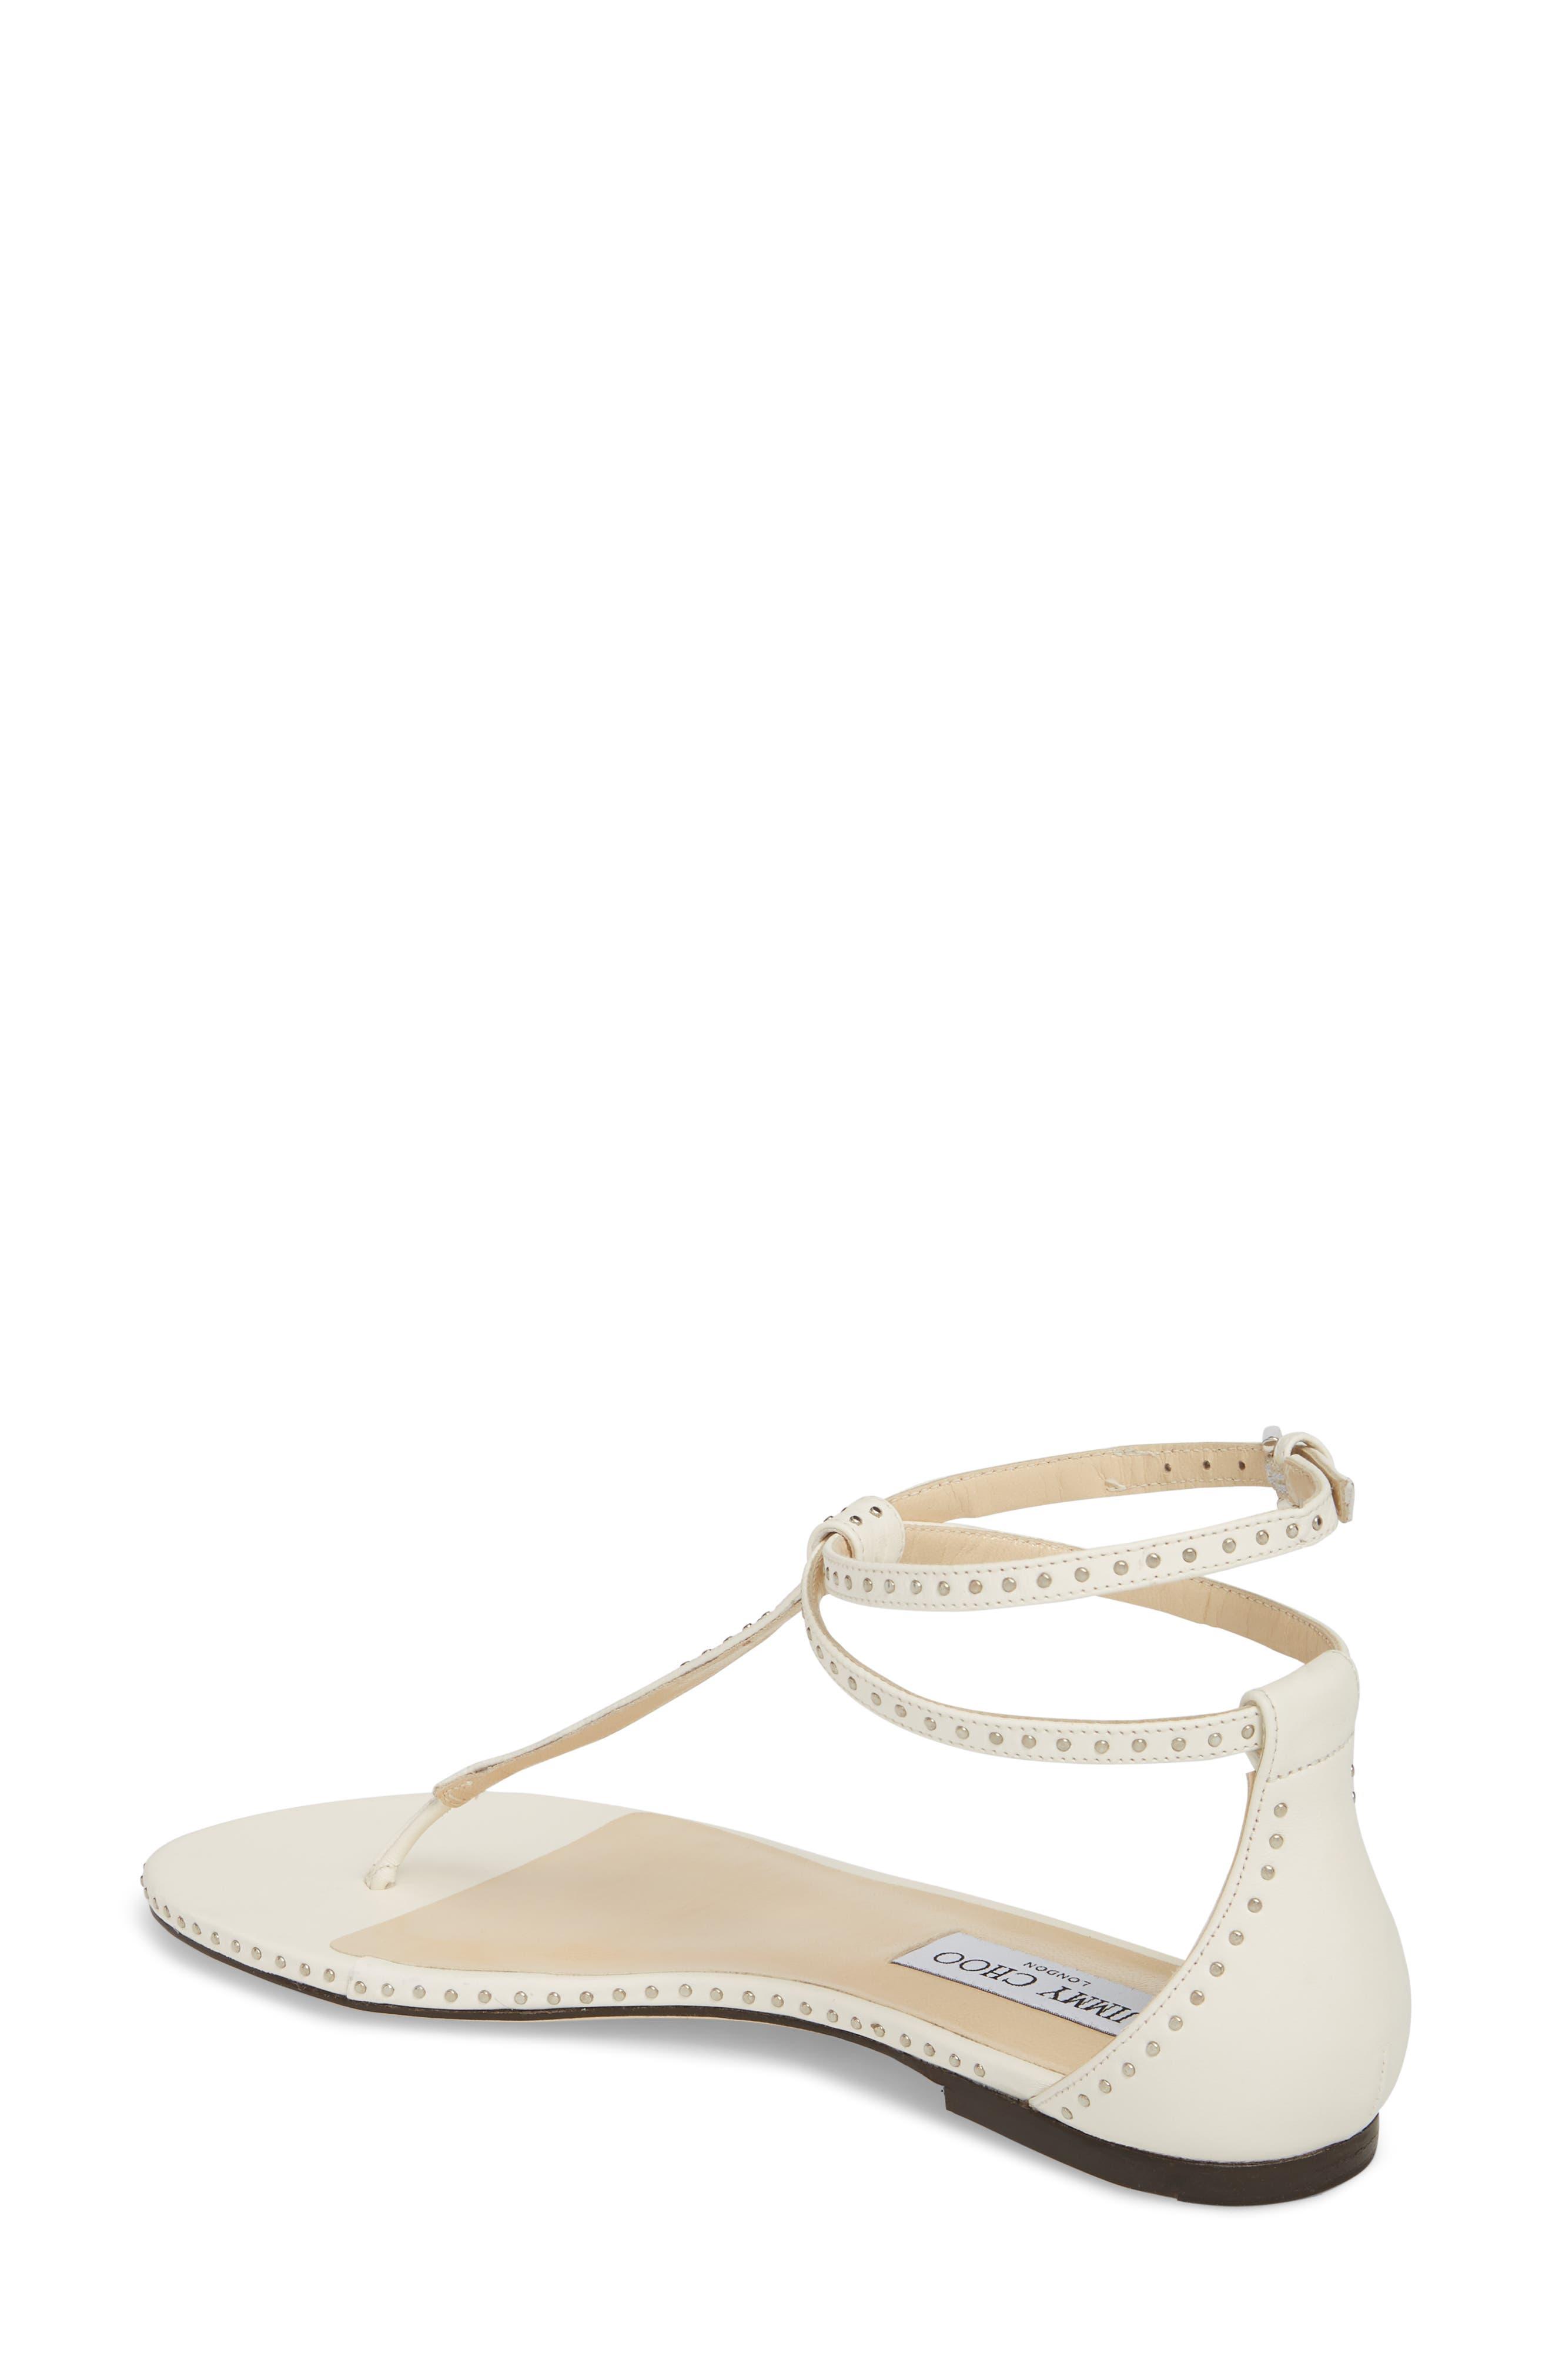 Afia Studded Flat Sandal,                             Alternate thumbnail 2, color,                             Chalk